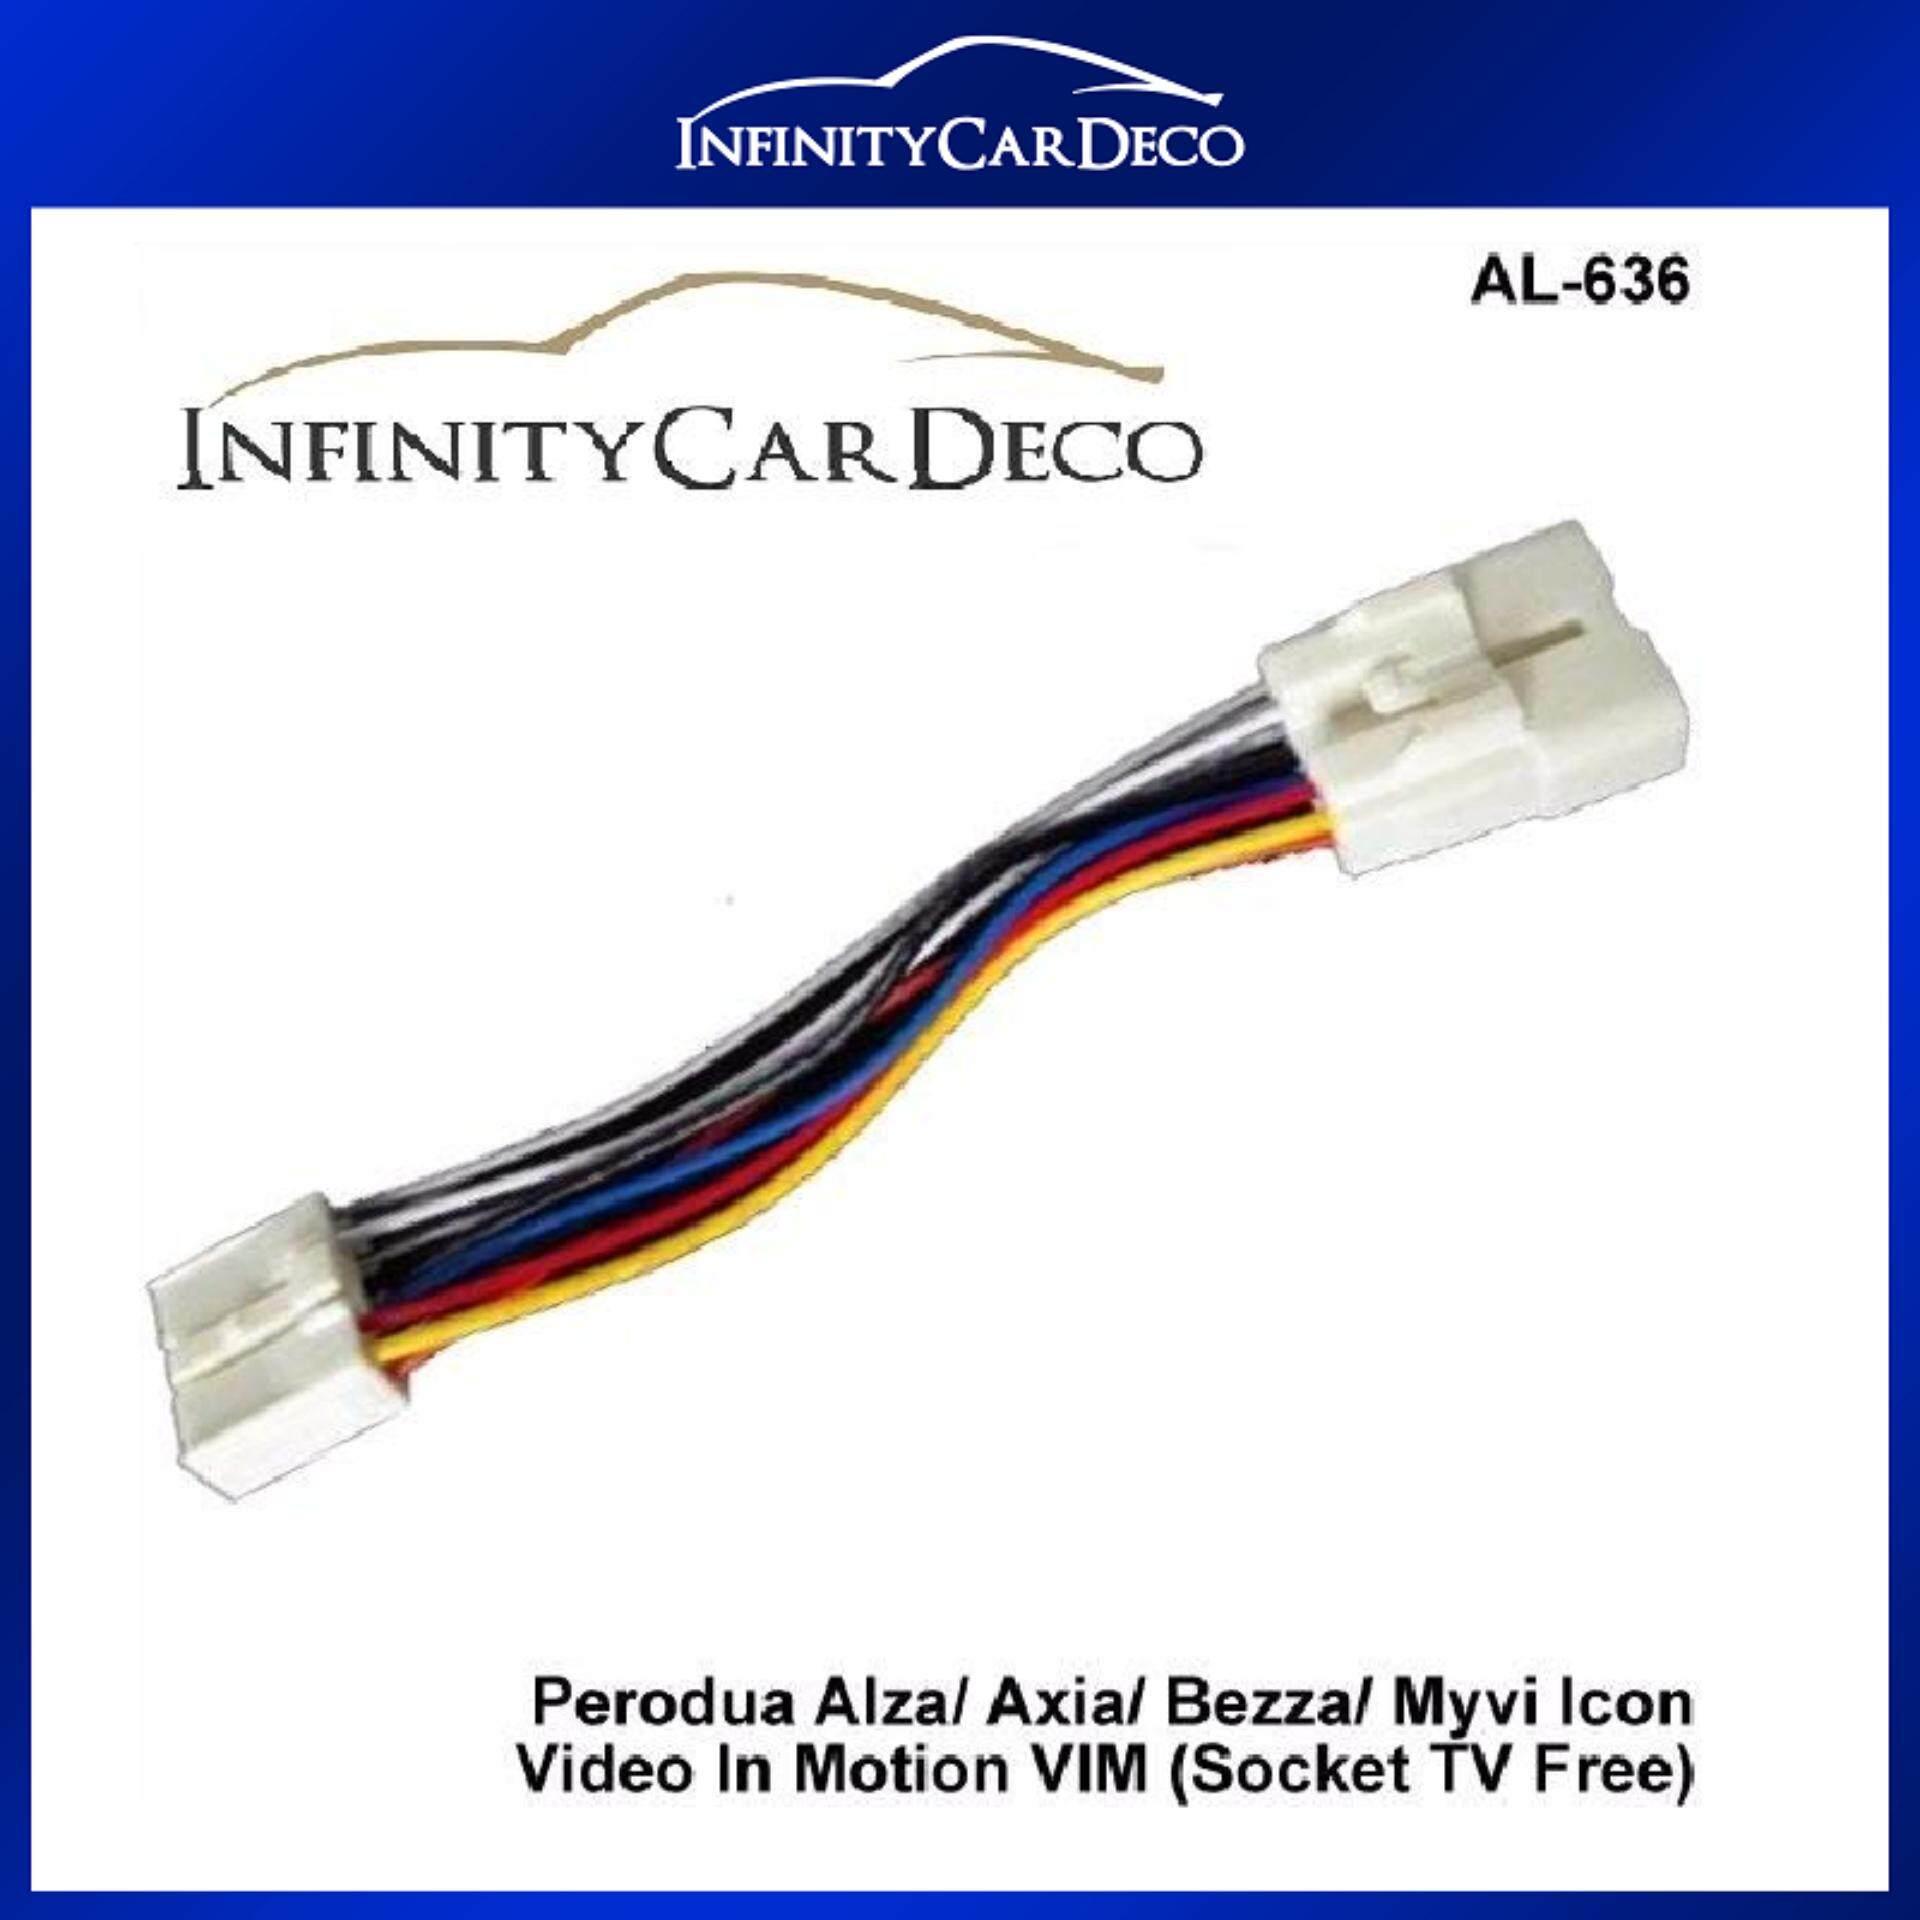 Perodua Axia Alza Bezza Myvi 2011-17 ByPass Cable Video In Motion TV Free